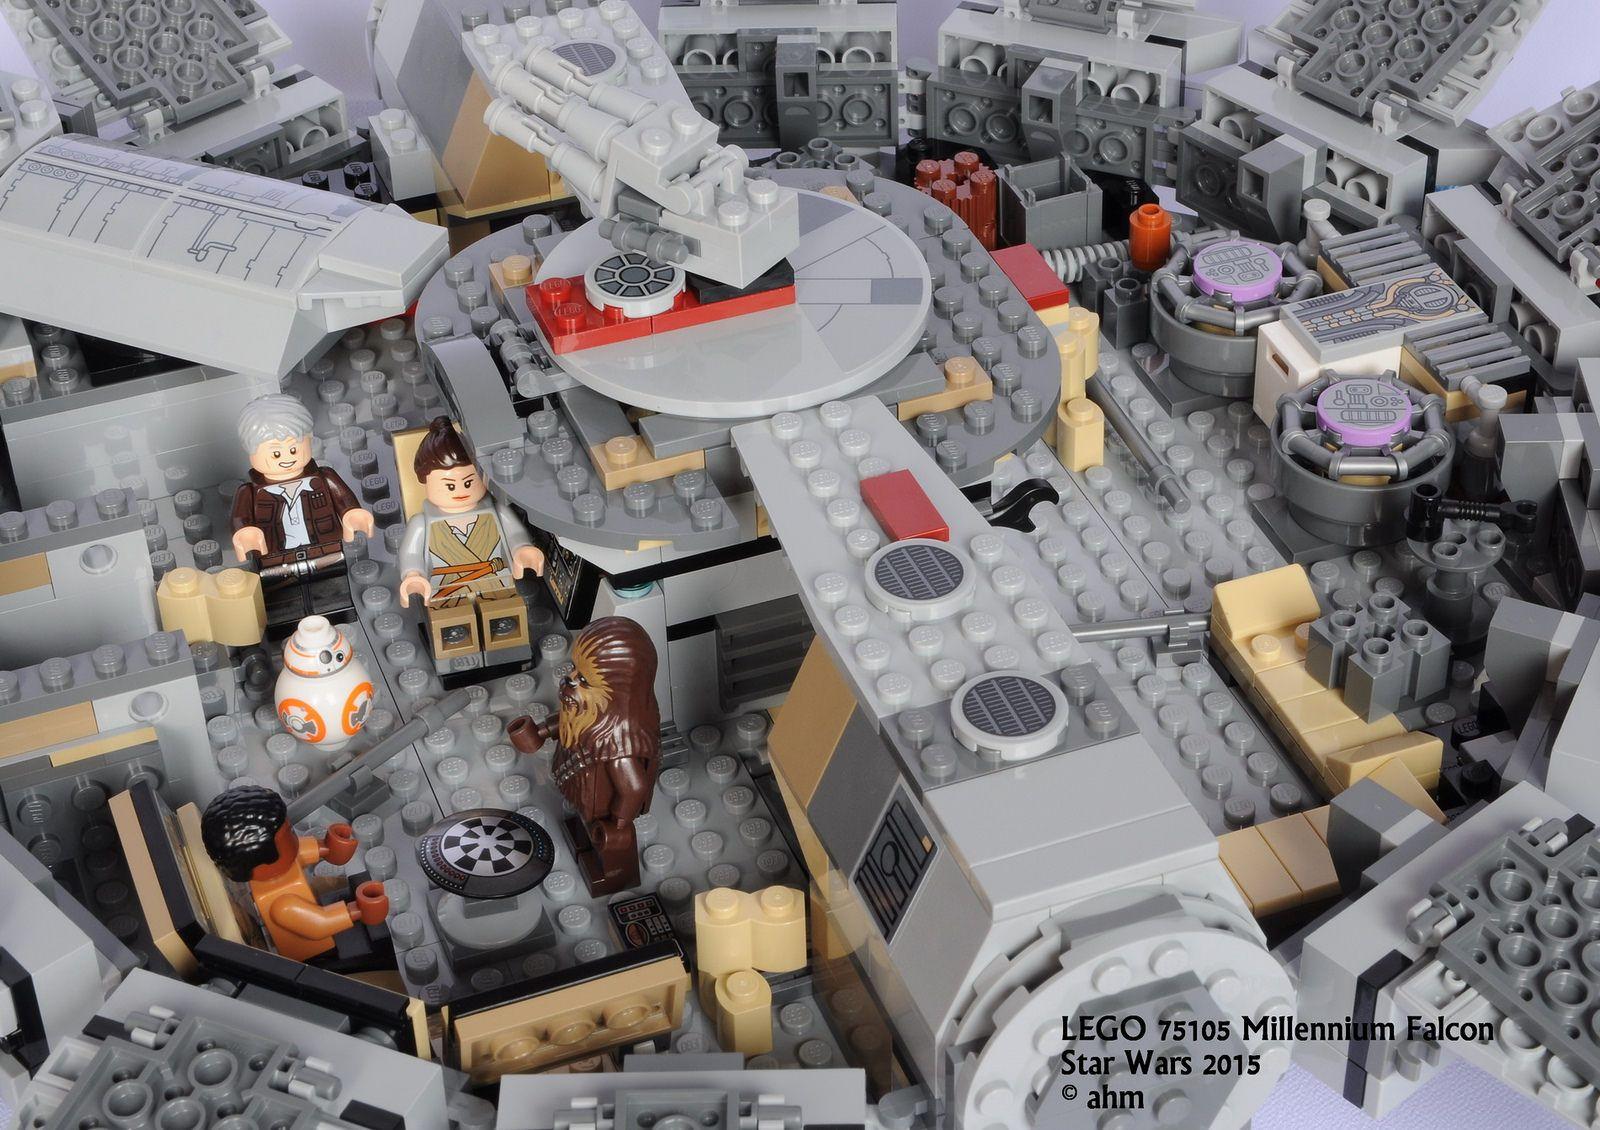 star wars lego 75105 millennium falcon lego falcon pinterest chewbacca falcons and lego. Black Bedroom Furniture Sets. Home Design Ideas